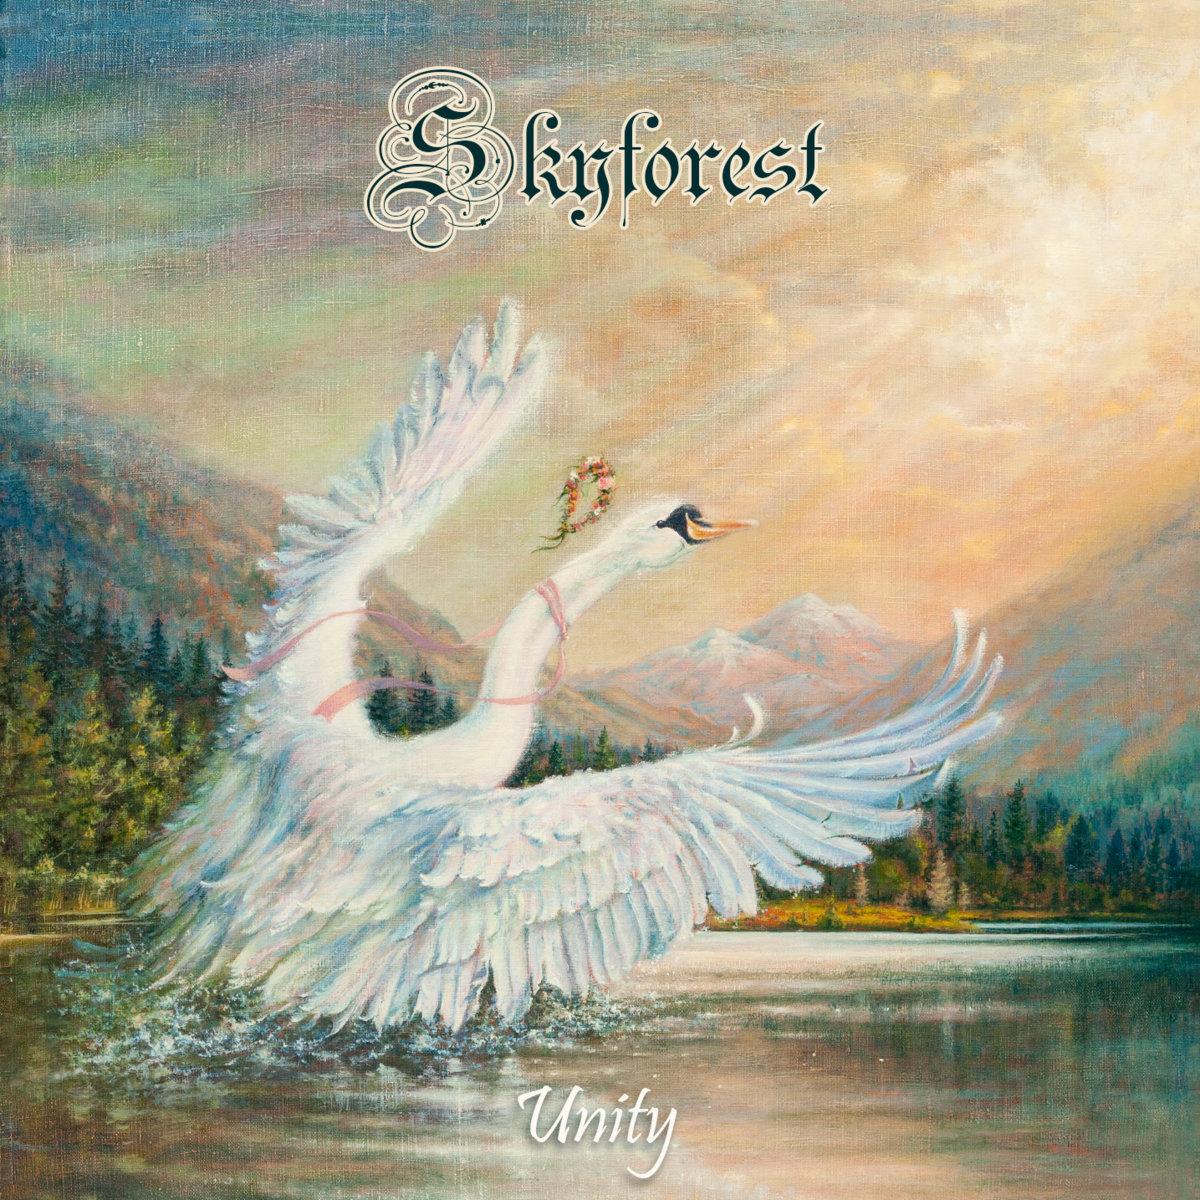 Skyforest unity